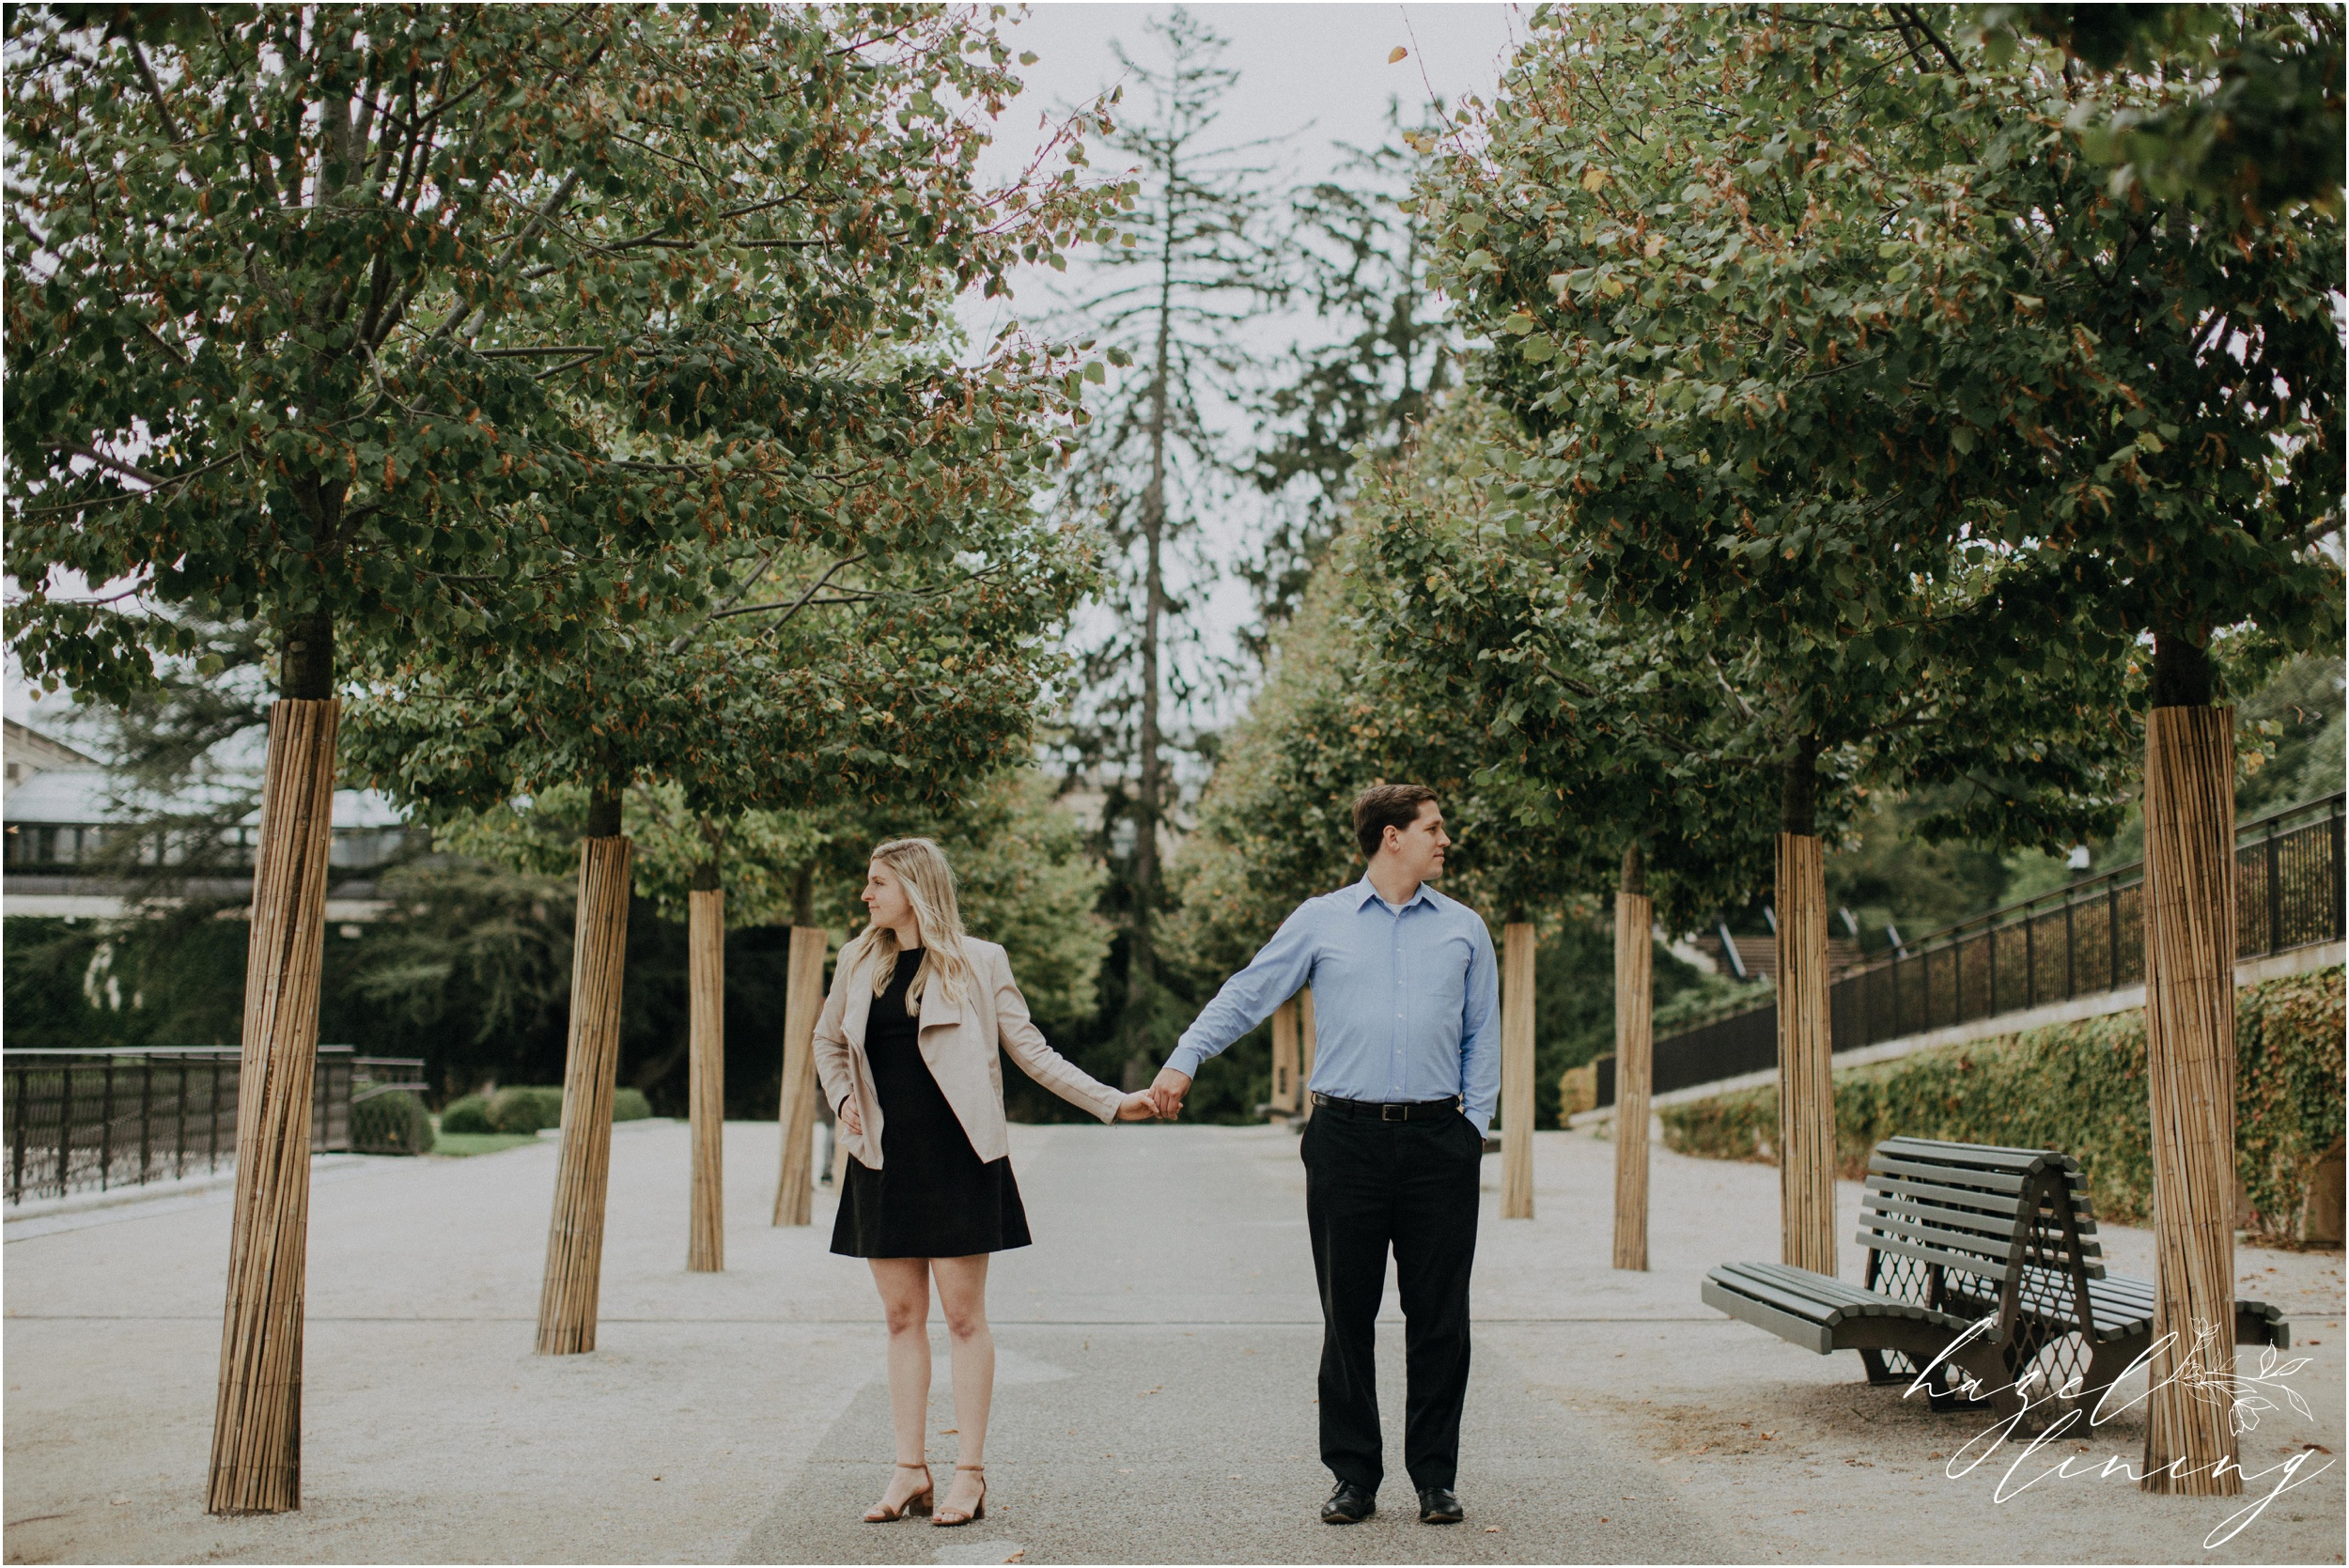 victoria-travis-logan-mayes-longwood-gardens-kennett-square-philadelphia-engagement-session-hazel-lining-photography-destination-elopement-wedding-engagement-photography_0019.jpg